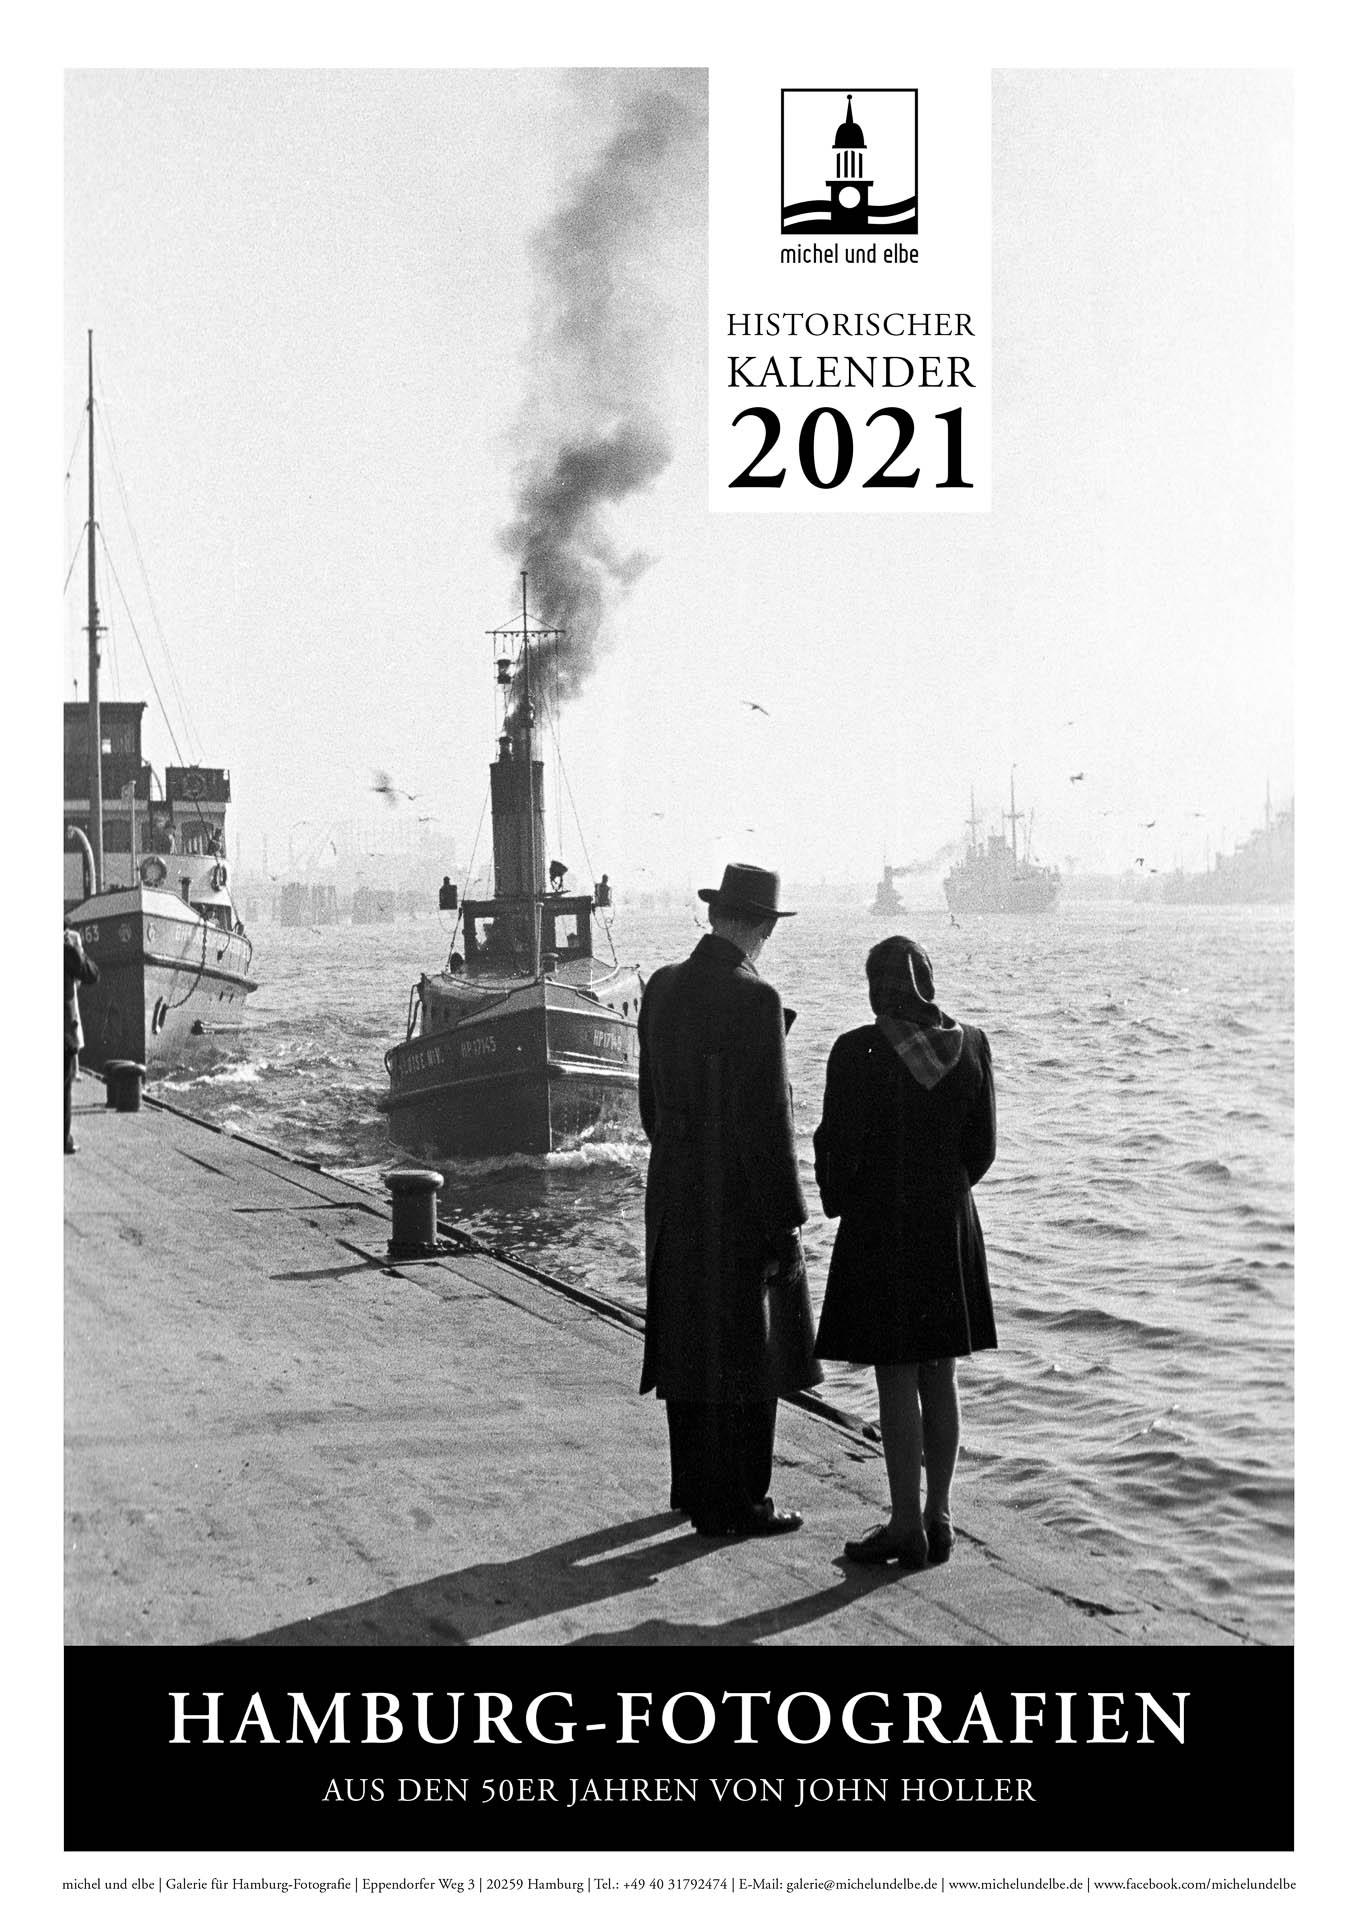 kalender_hamburg_Historisch_2021_01